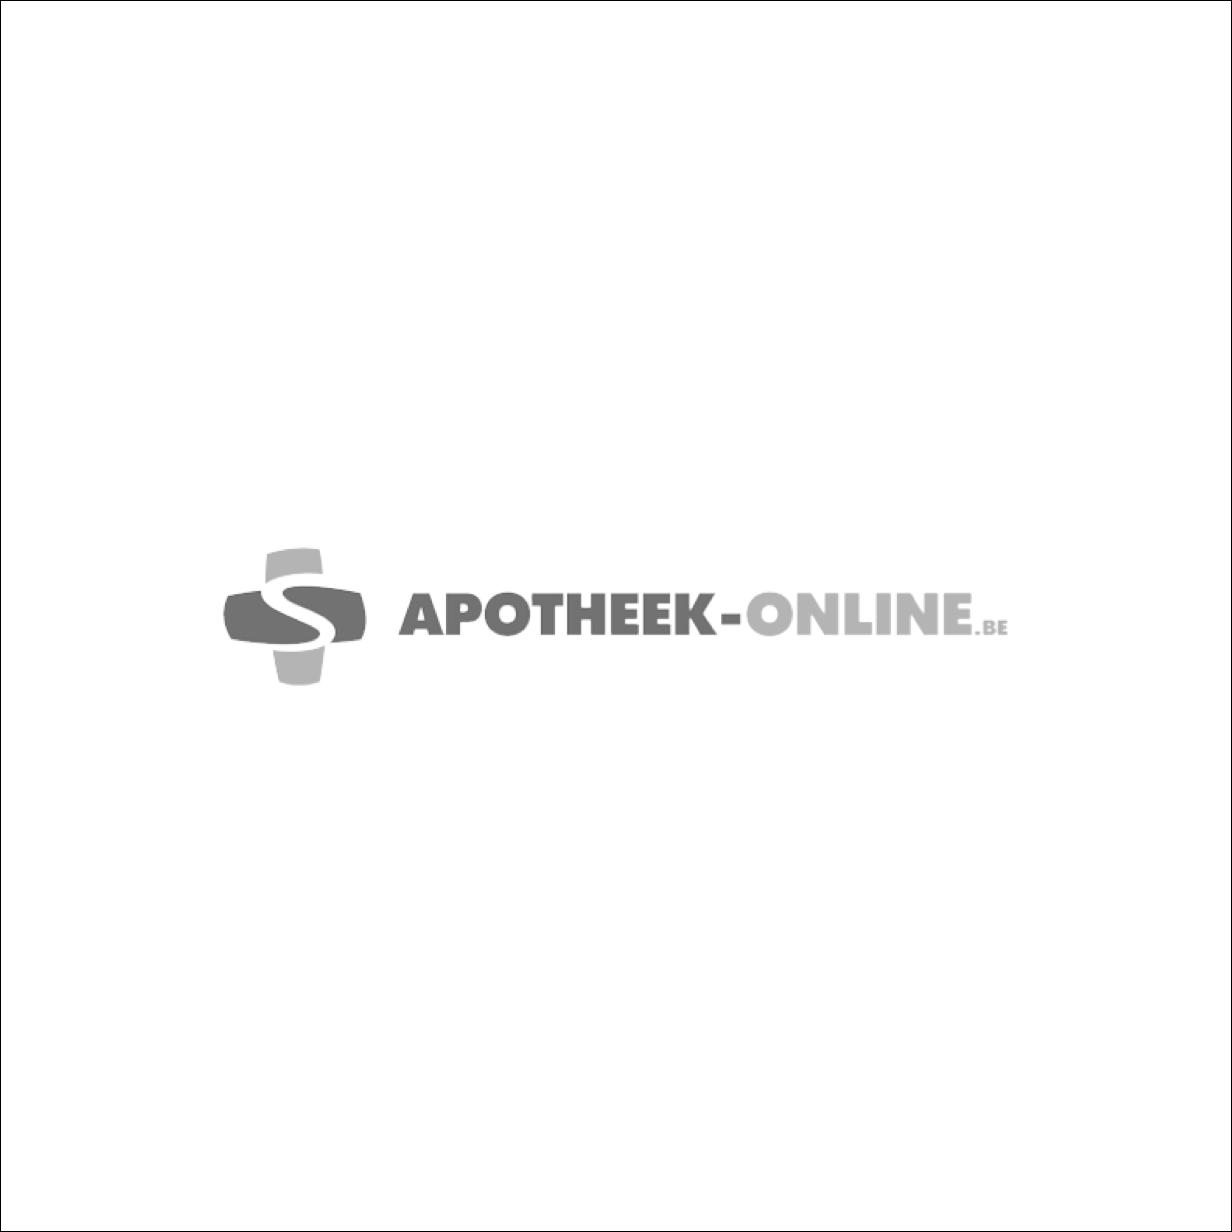 MESOFT CP N/ST 4C 10,0X20,0CM 200 156400